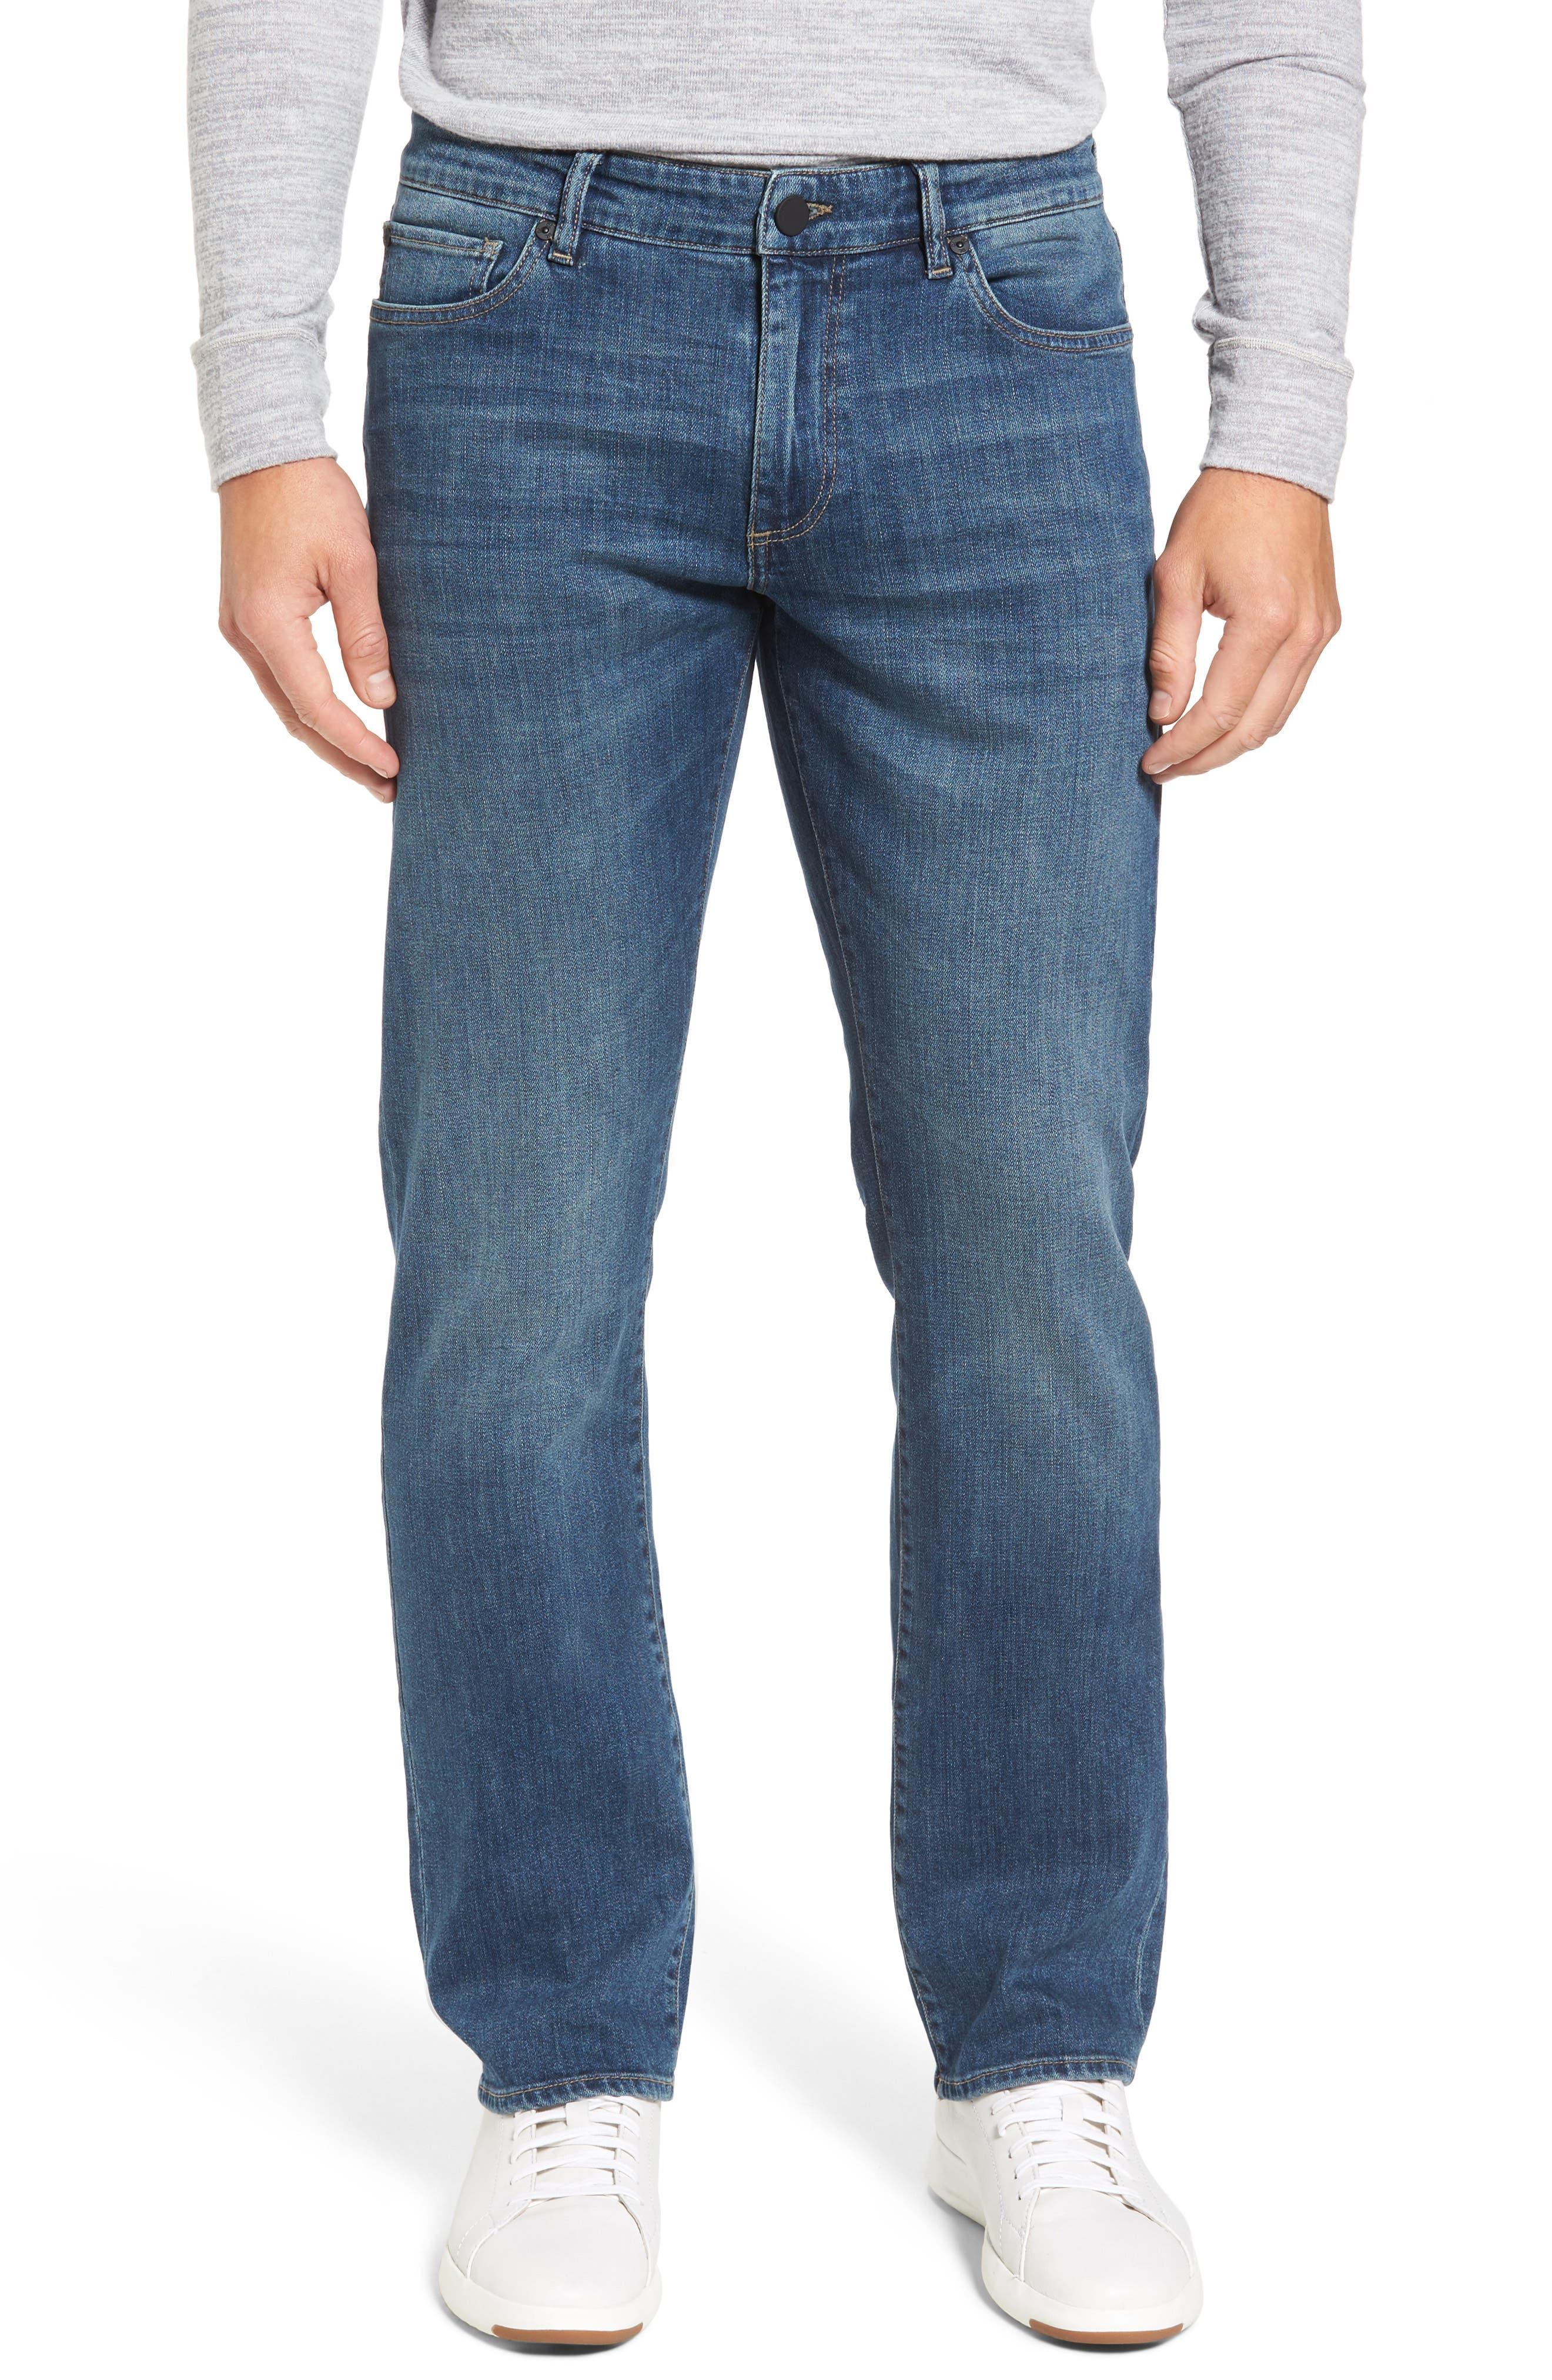 Avery Slim Straight Leg Jeans,                         Main,                         color,